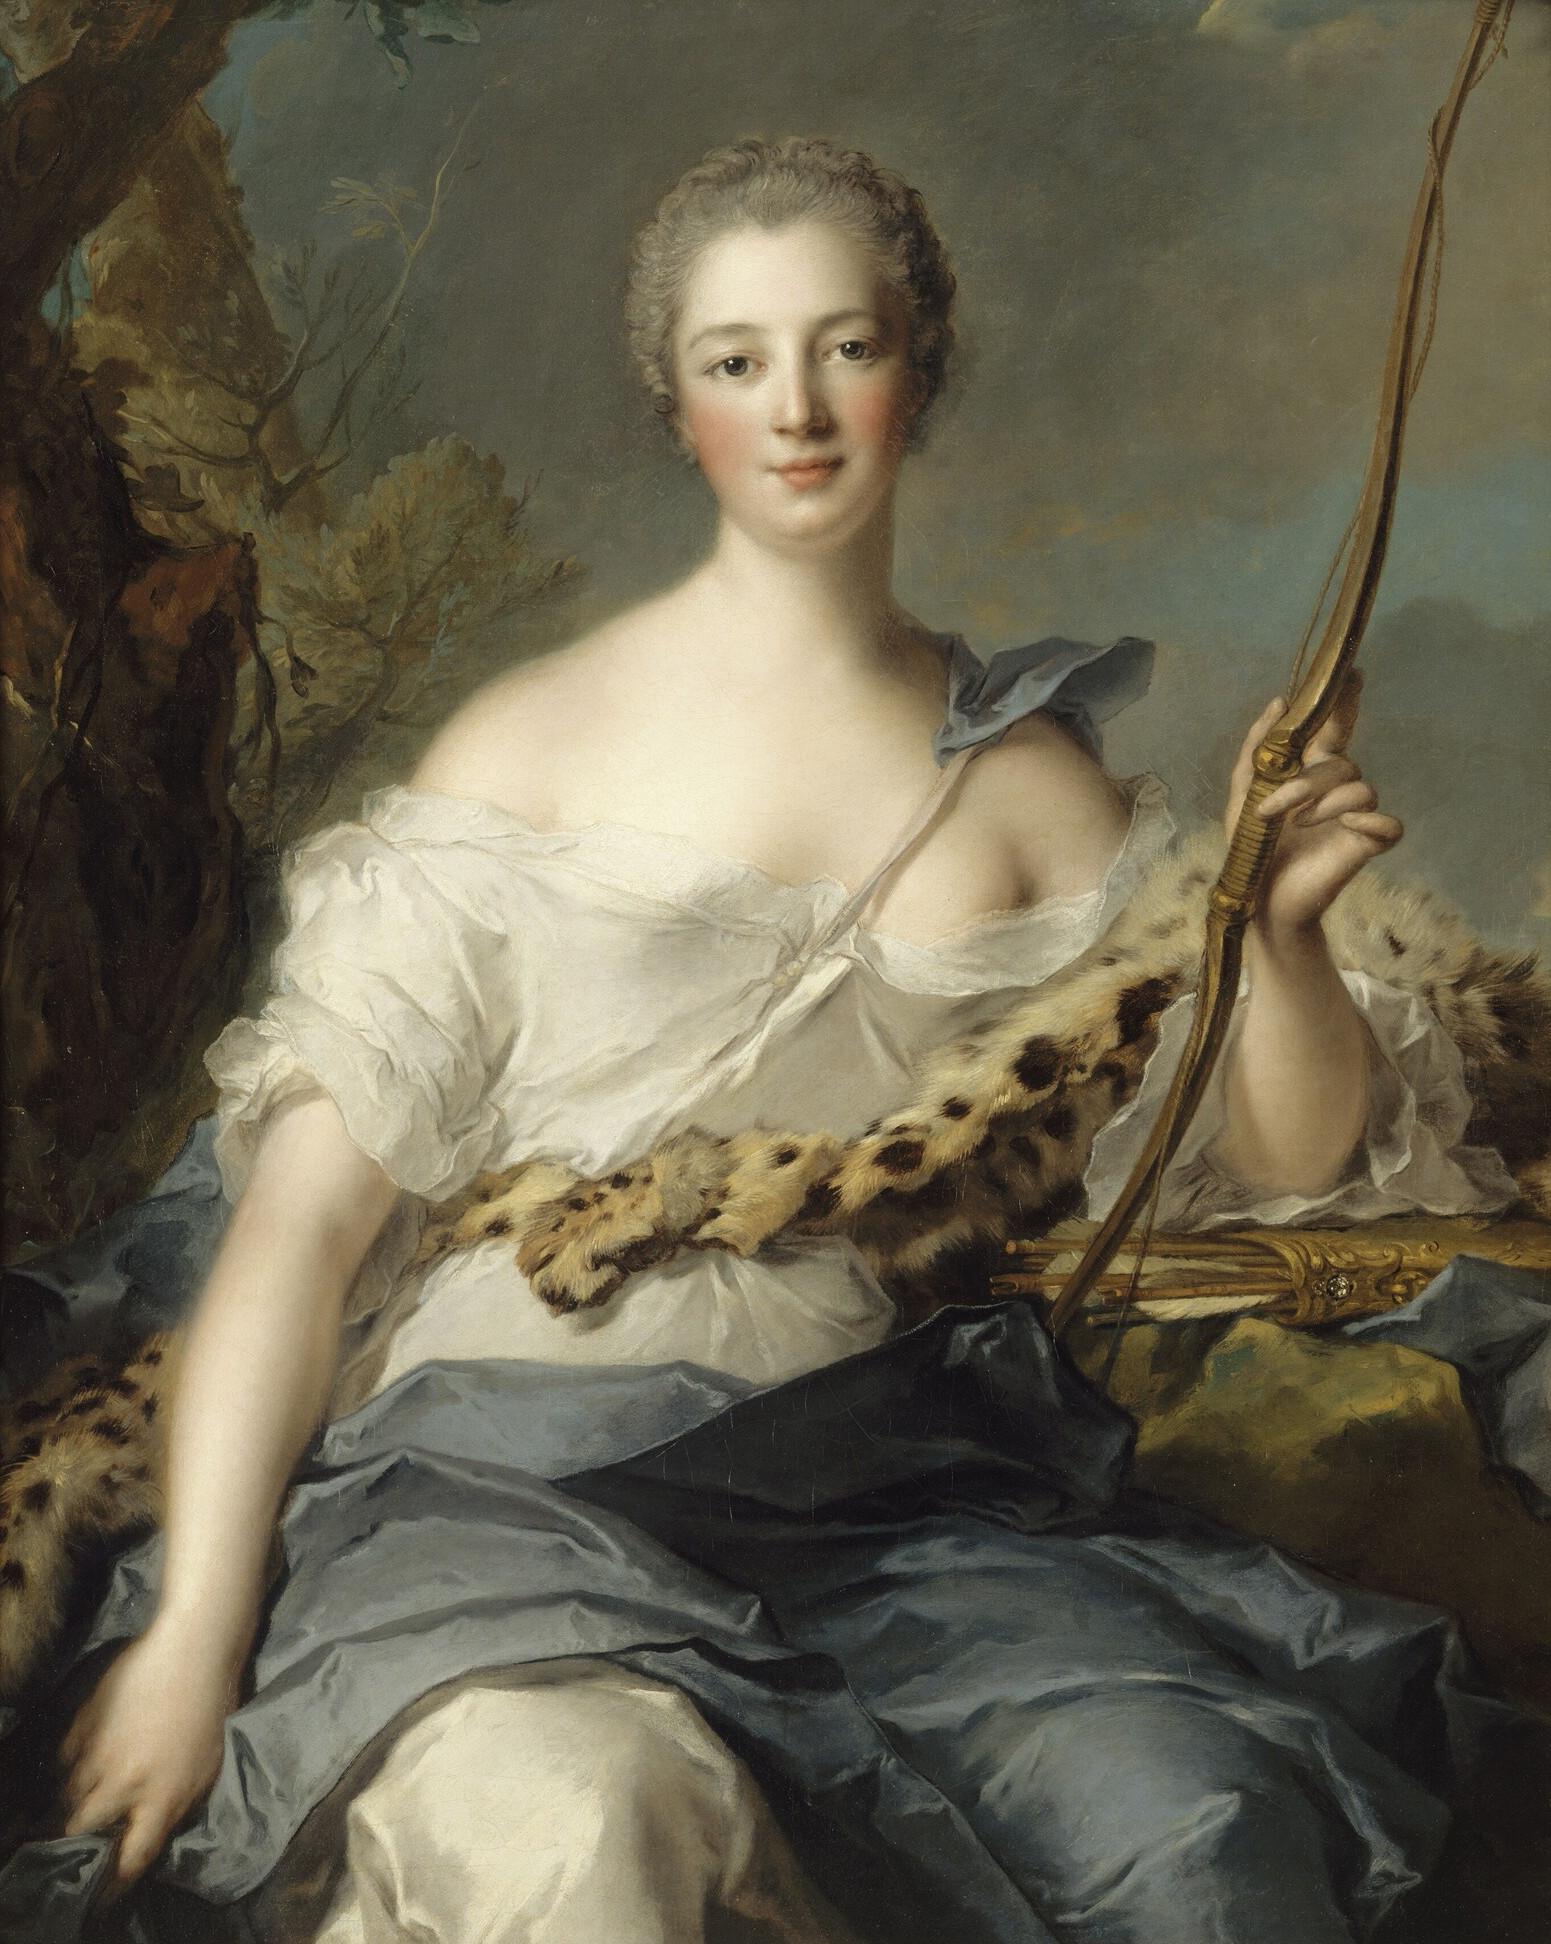 Маркиза де Помпадур вобразе Дианы. <br>